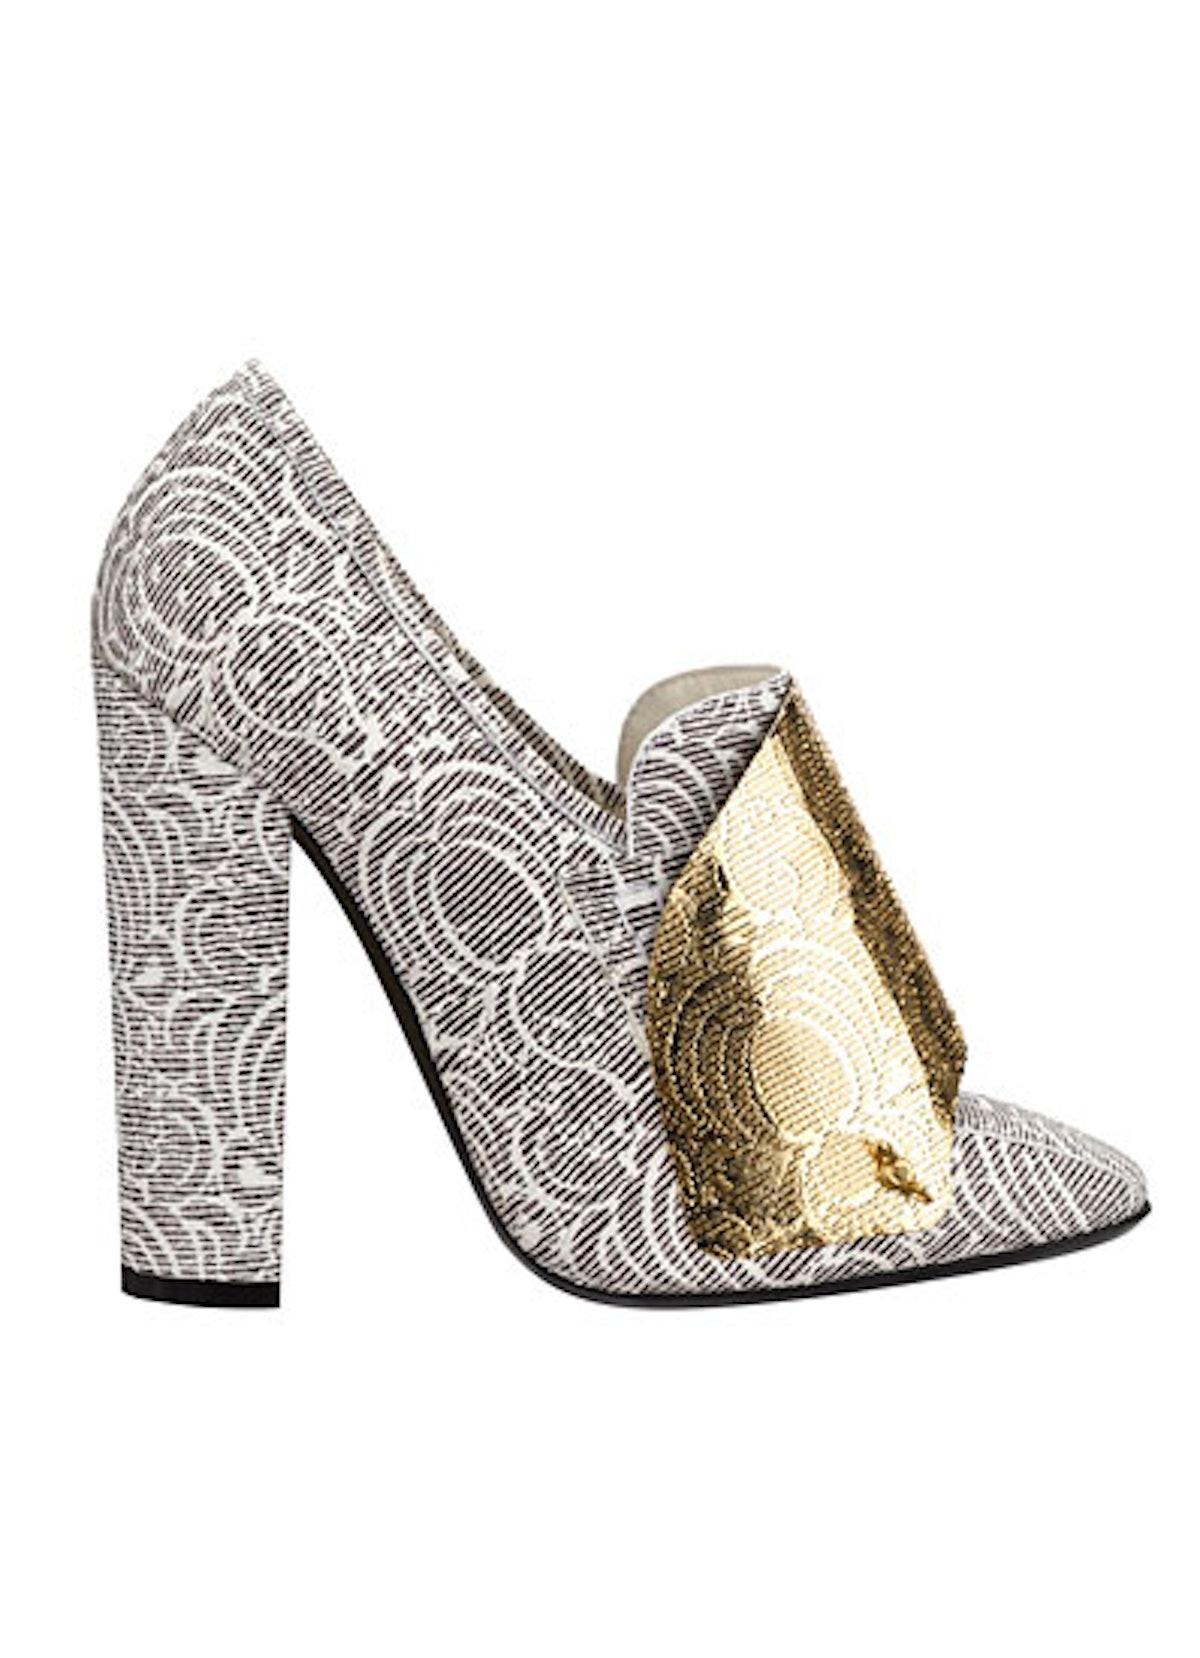 fass-gold-fashion-trend-02-v.jpg